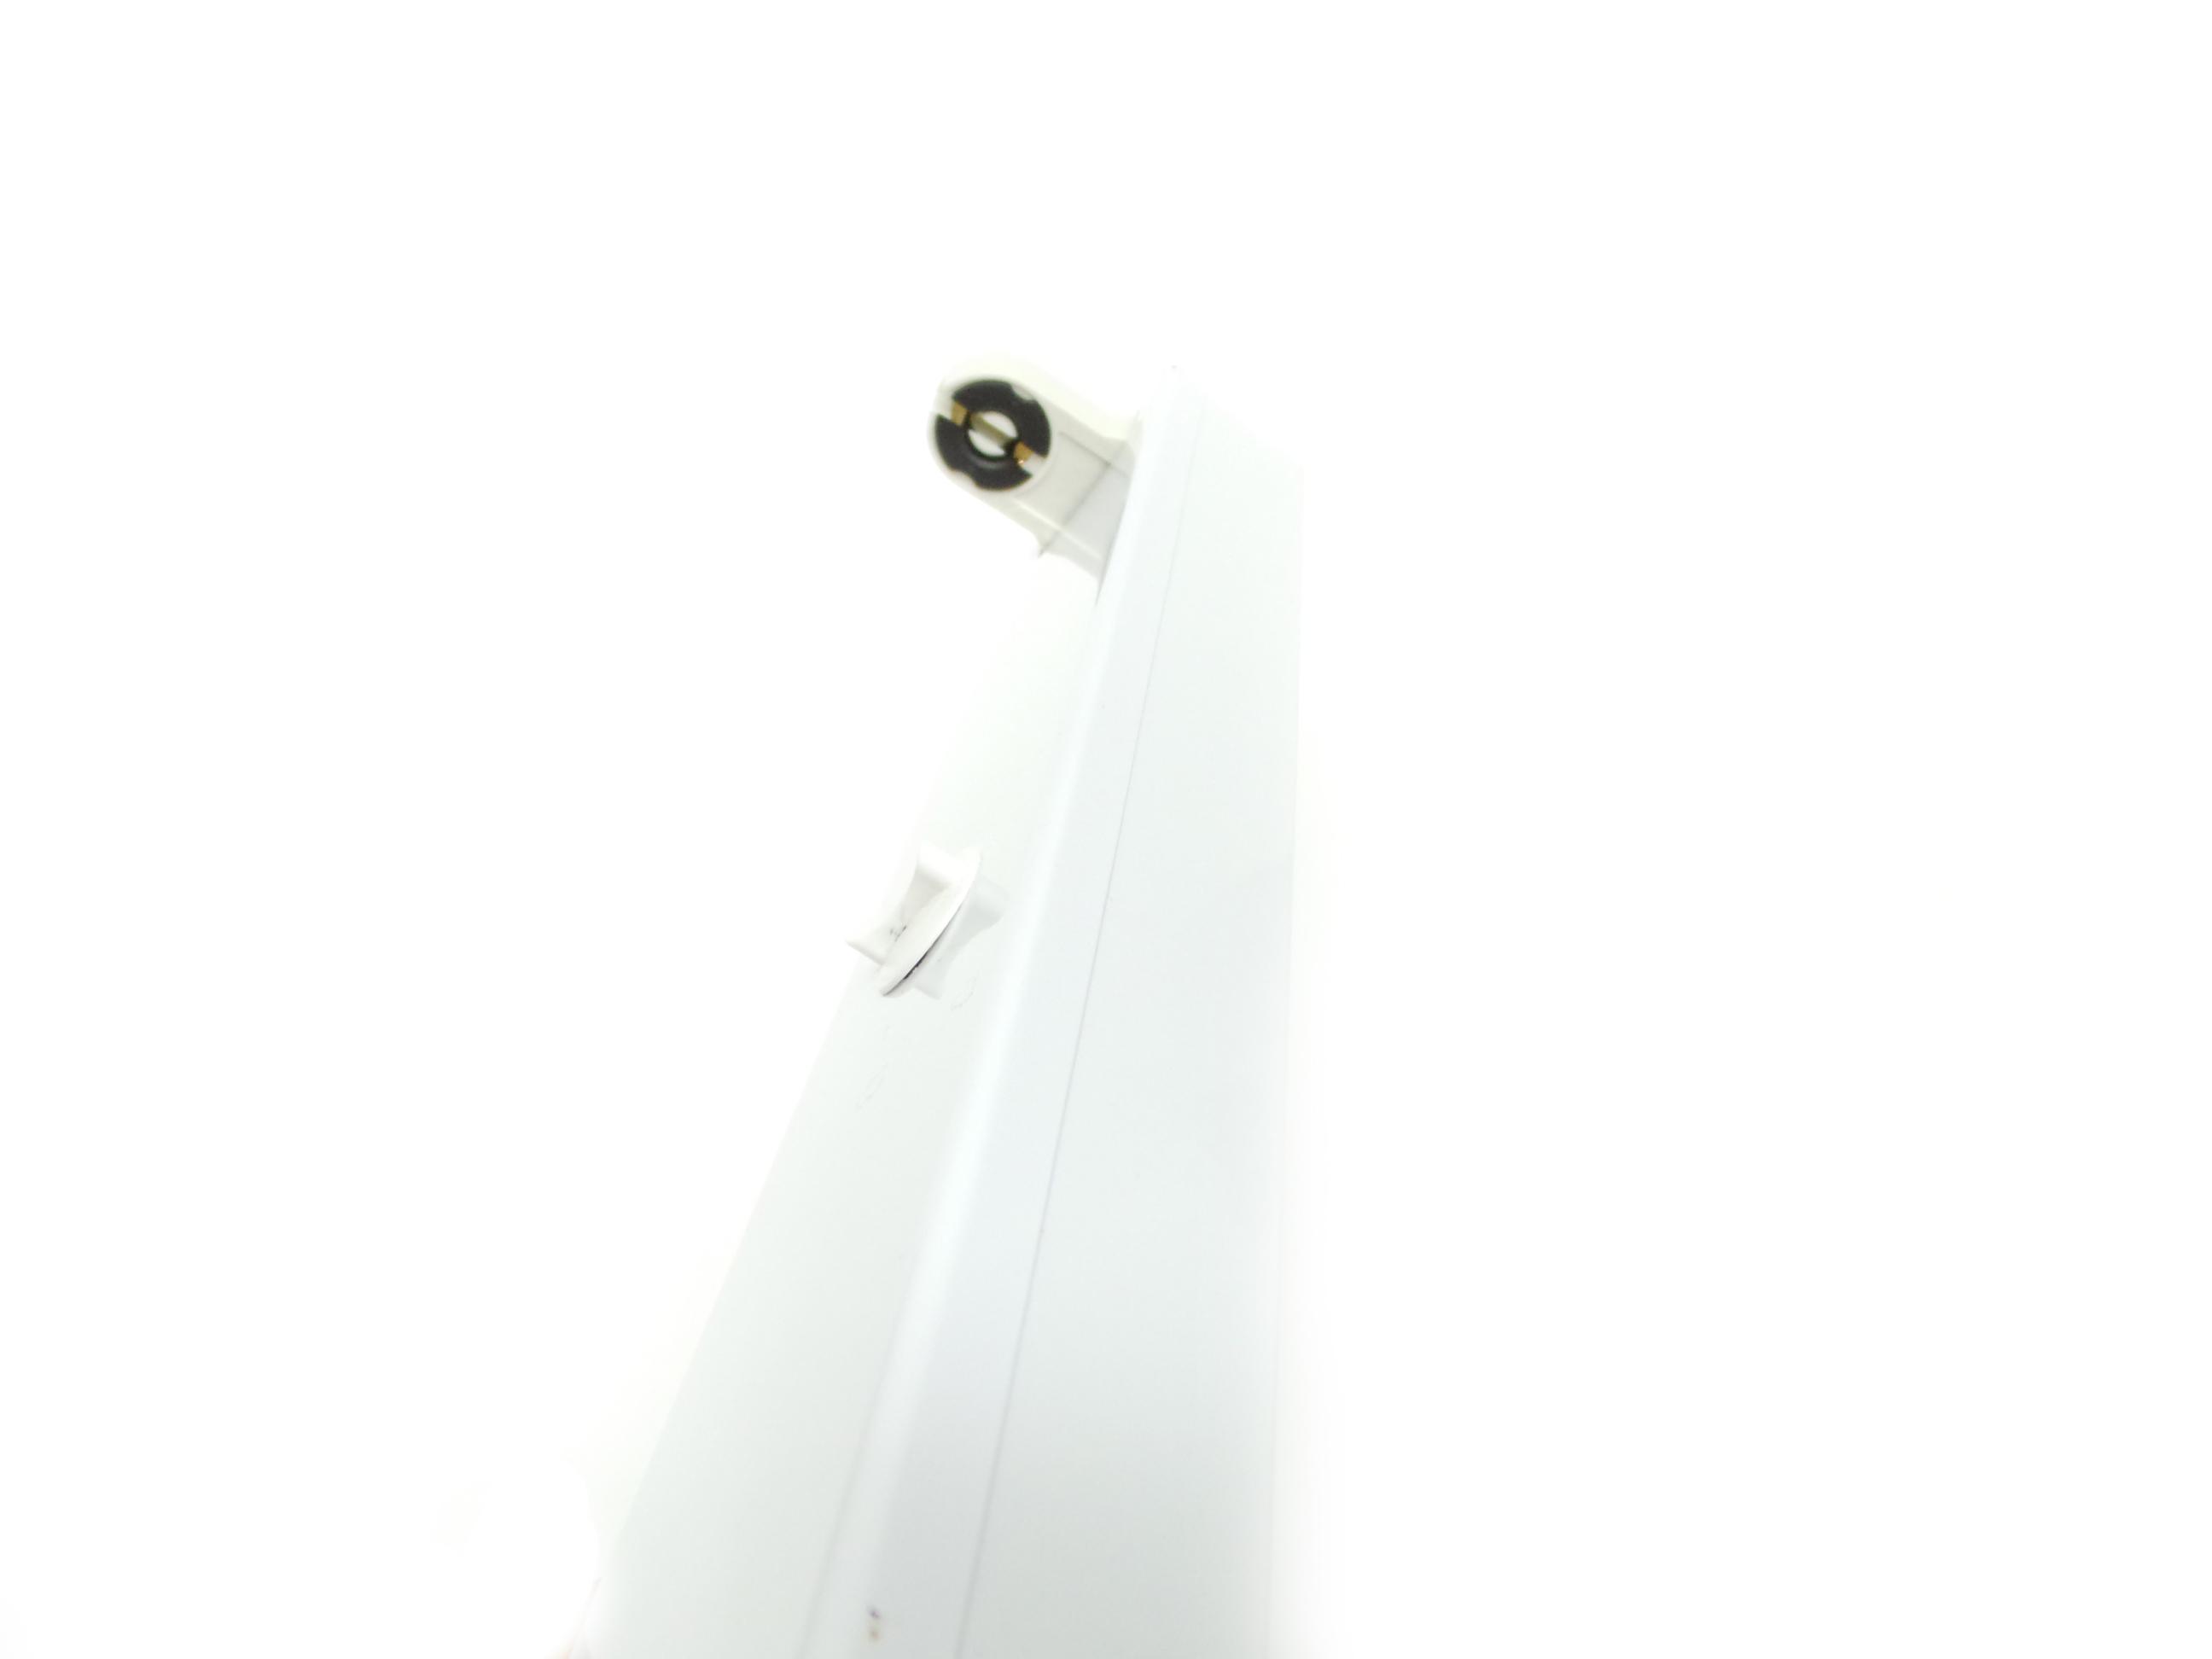 r2 120cm offerte plafoniere pannelli led silamp. Black Bedroom Furniture Sets. Home Design Ideas